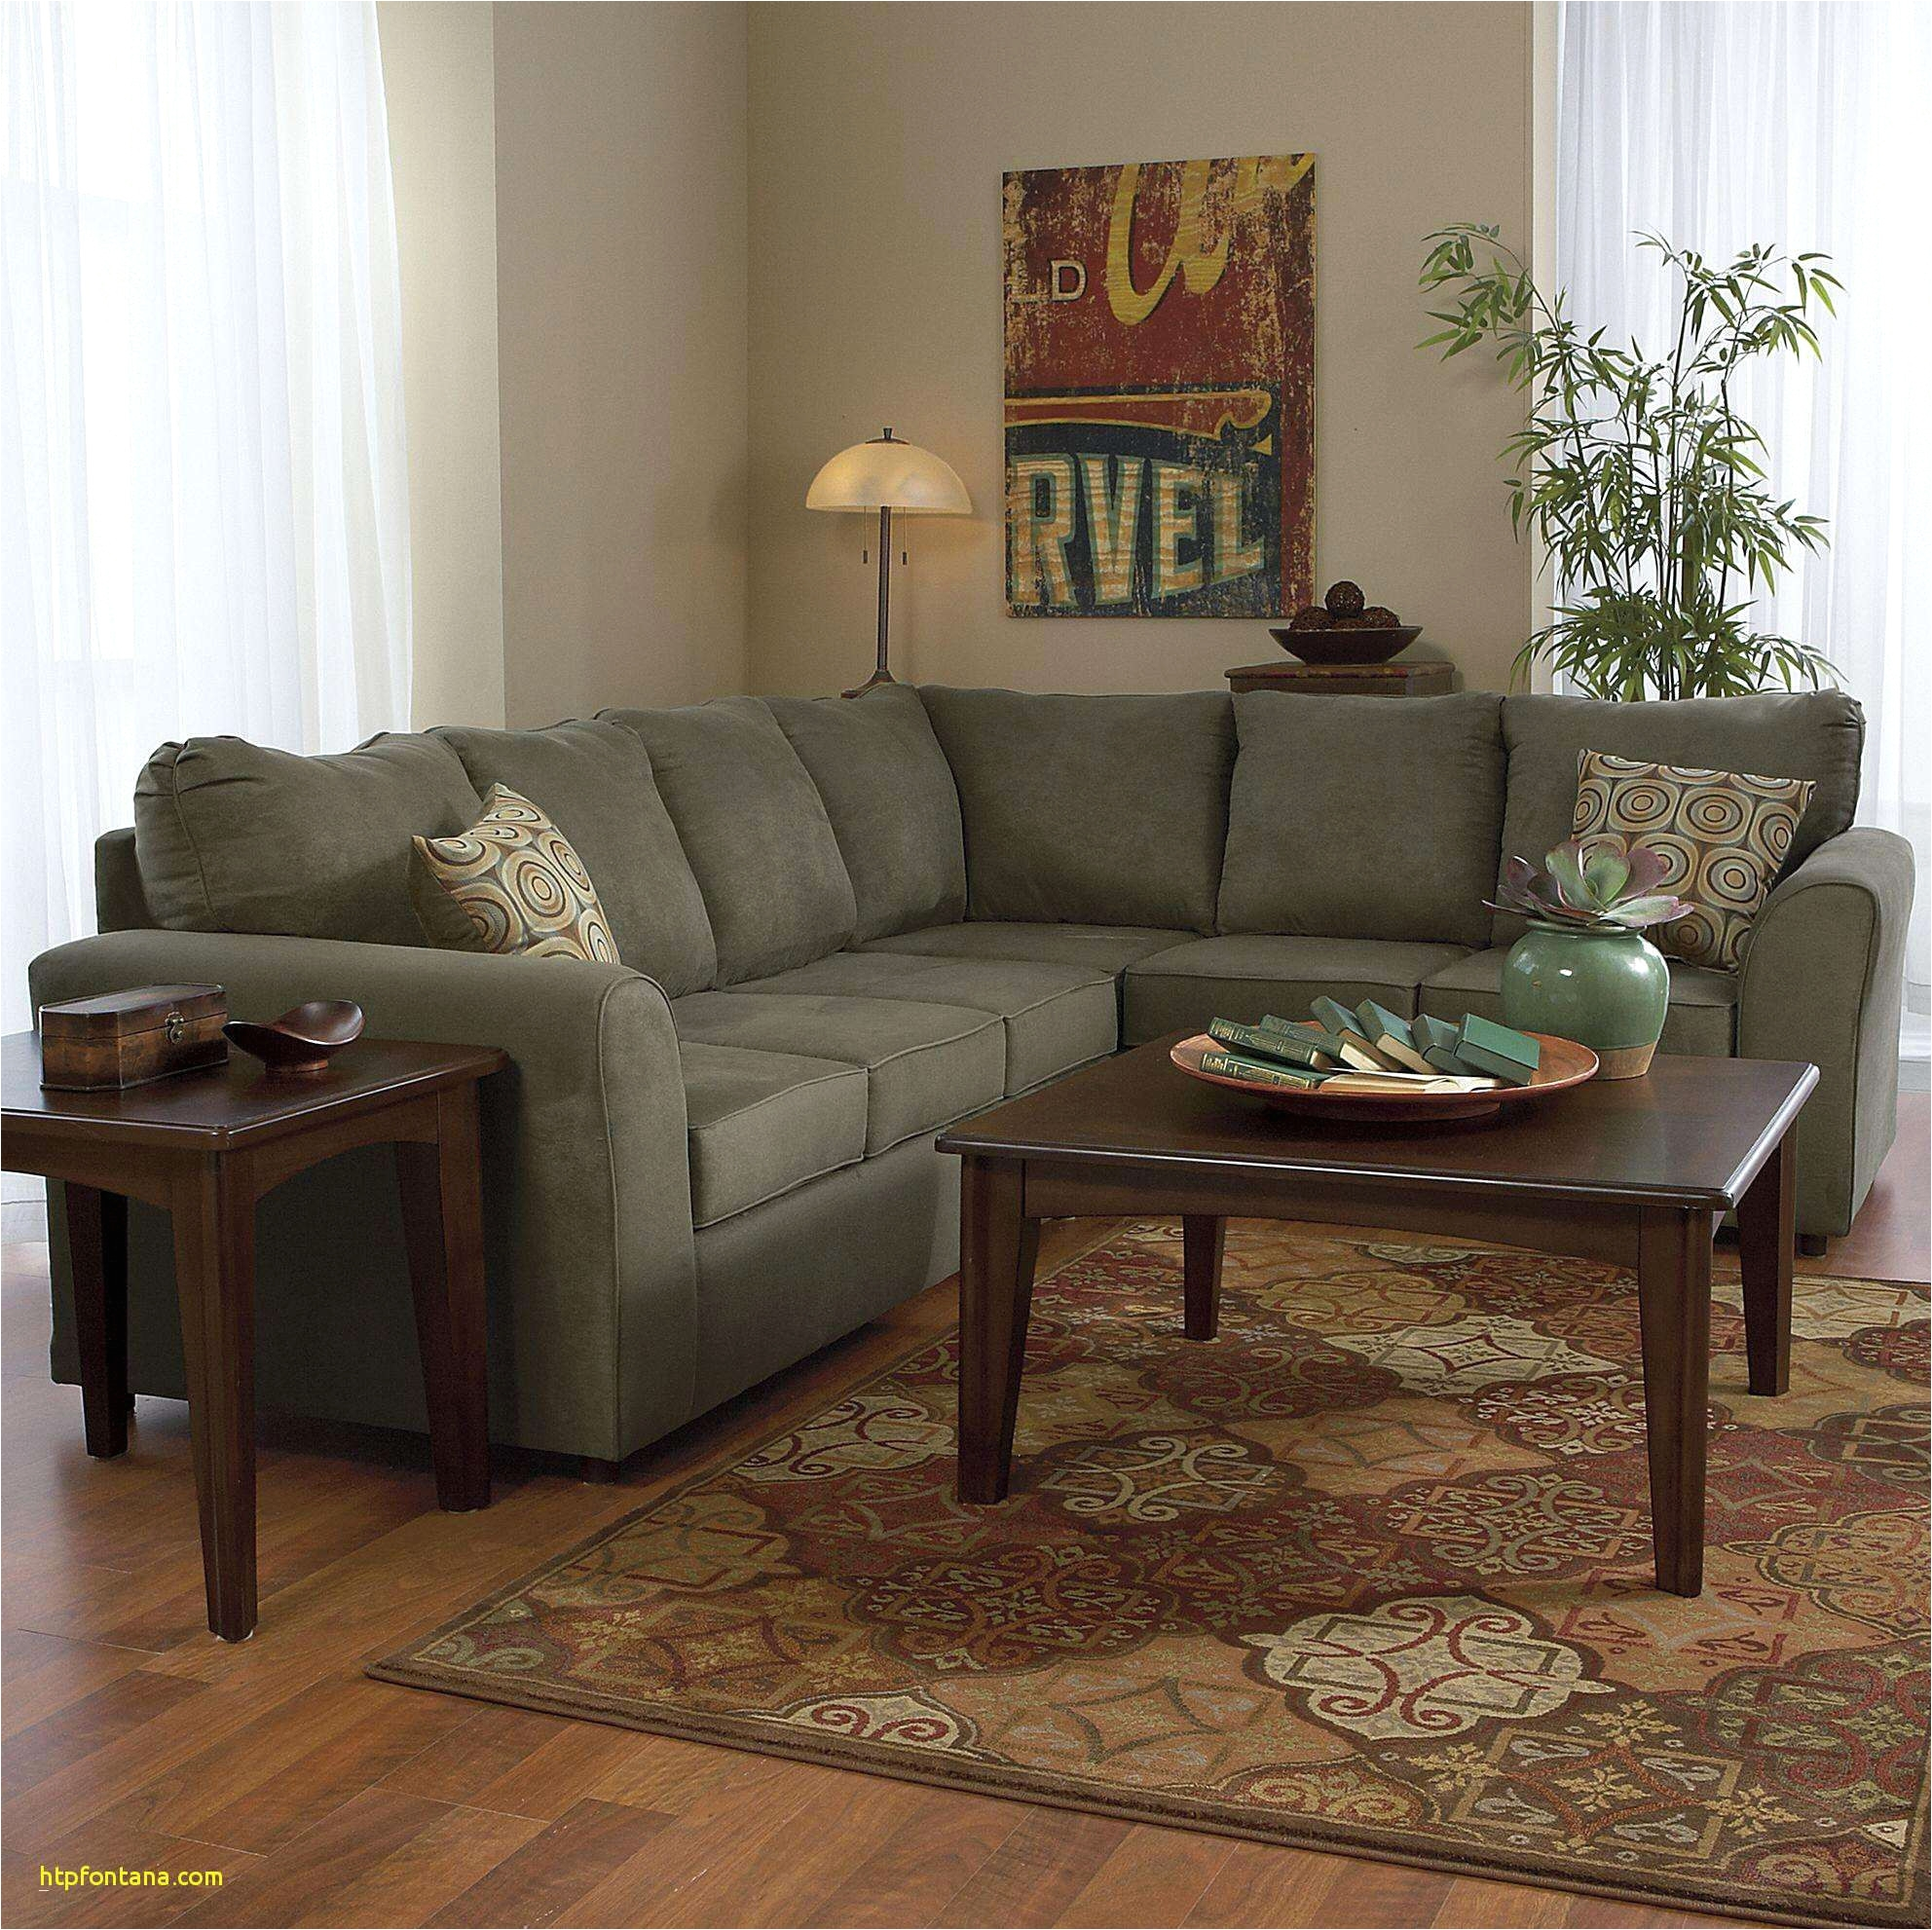 living room design image fresh furniture sleeper loveseat new wicker outdoor sofa 0d patio